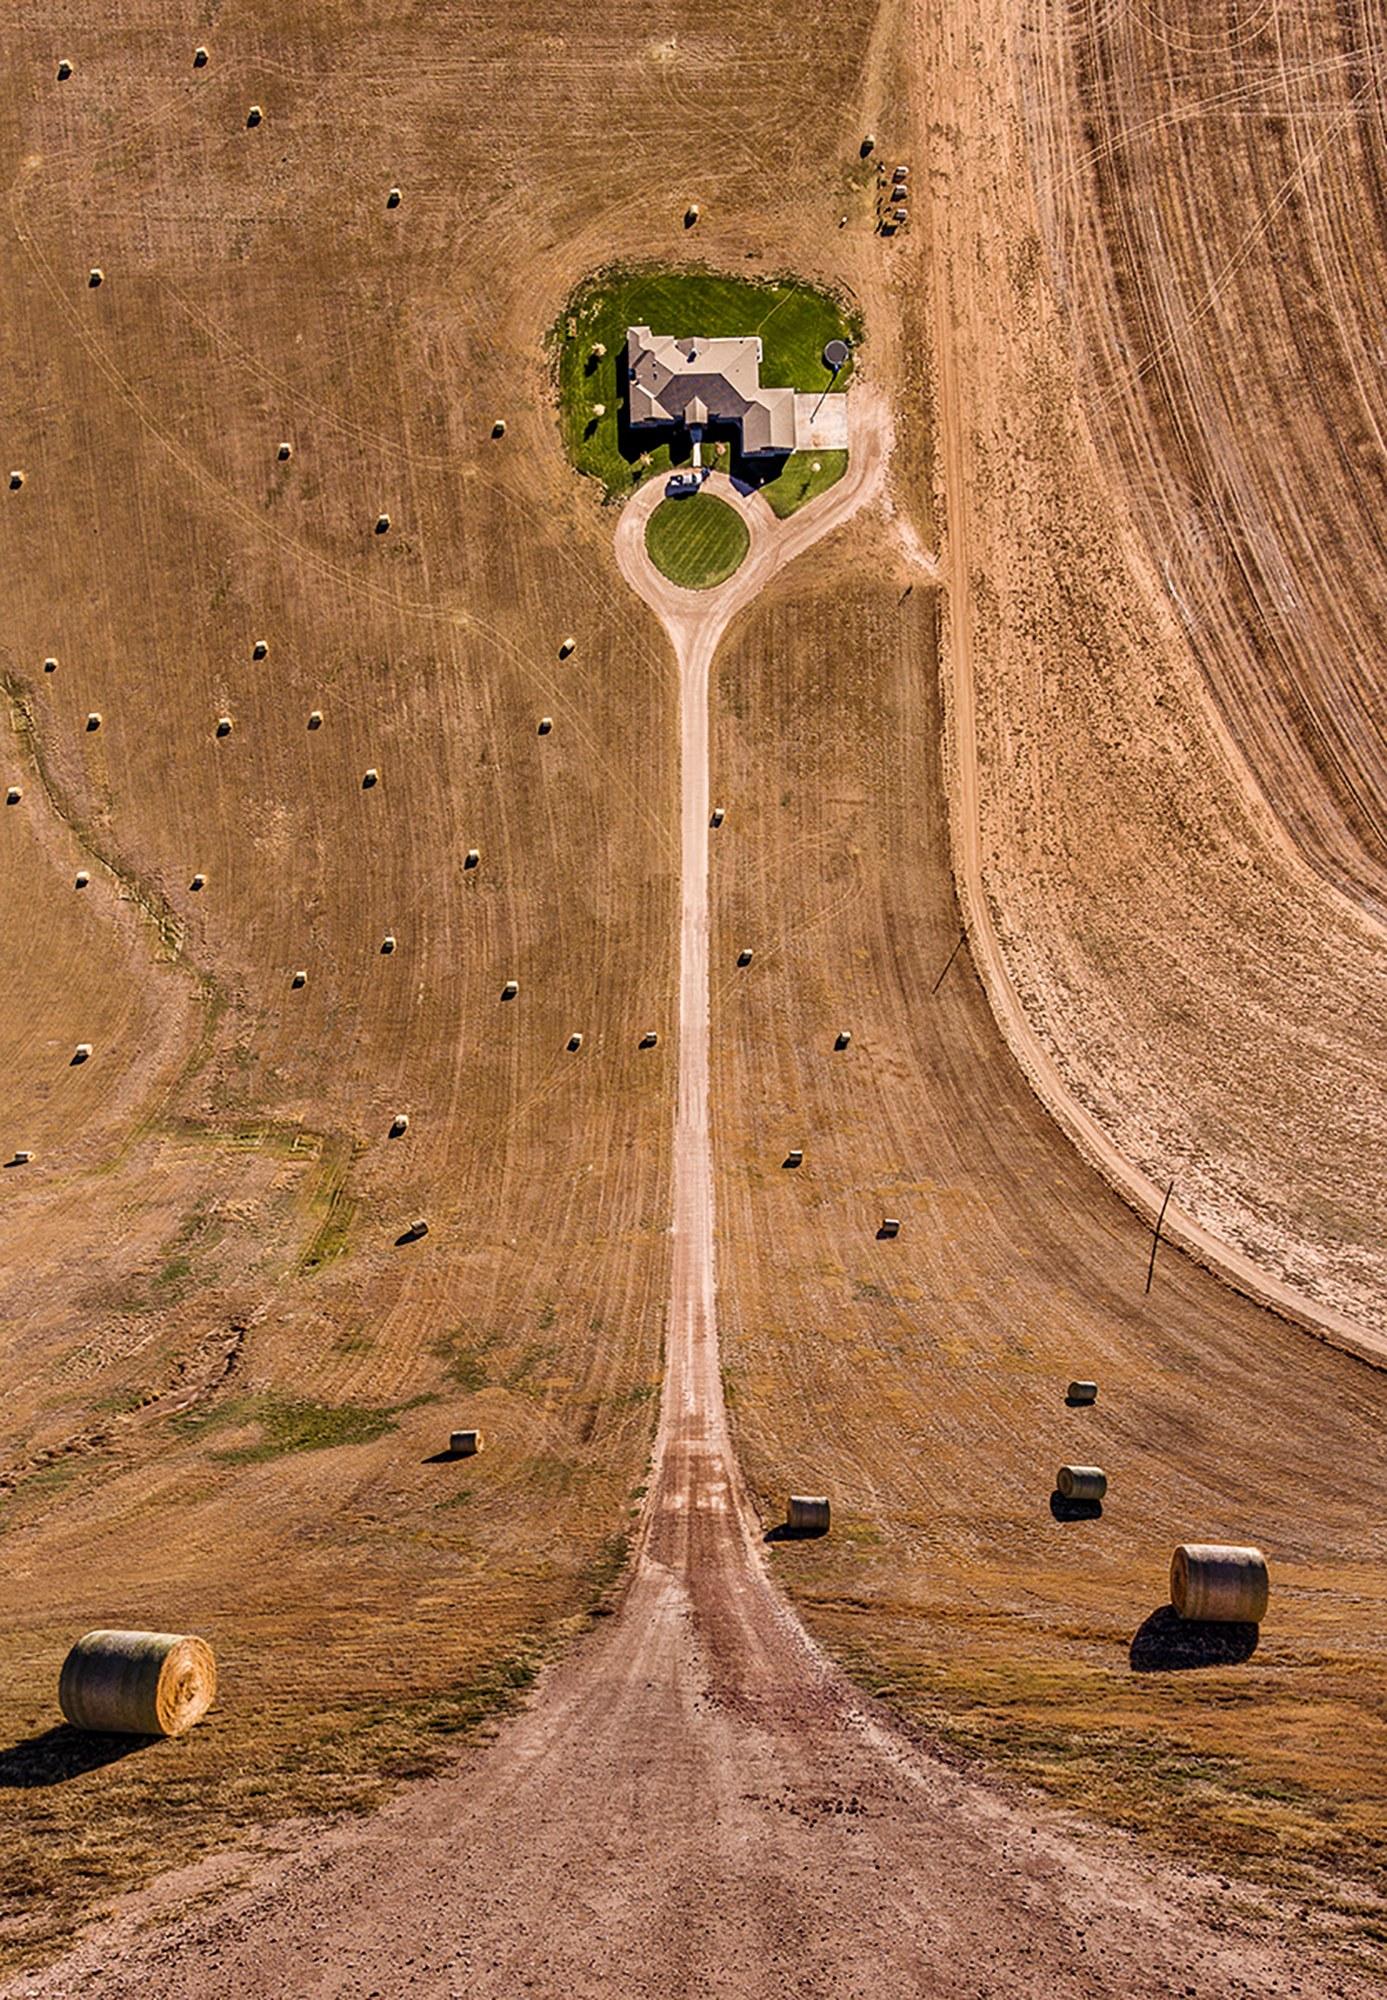 farm_with_bales-copy.jpg